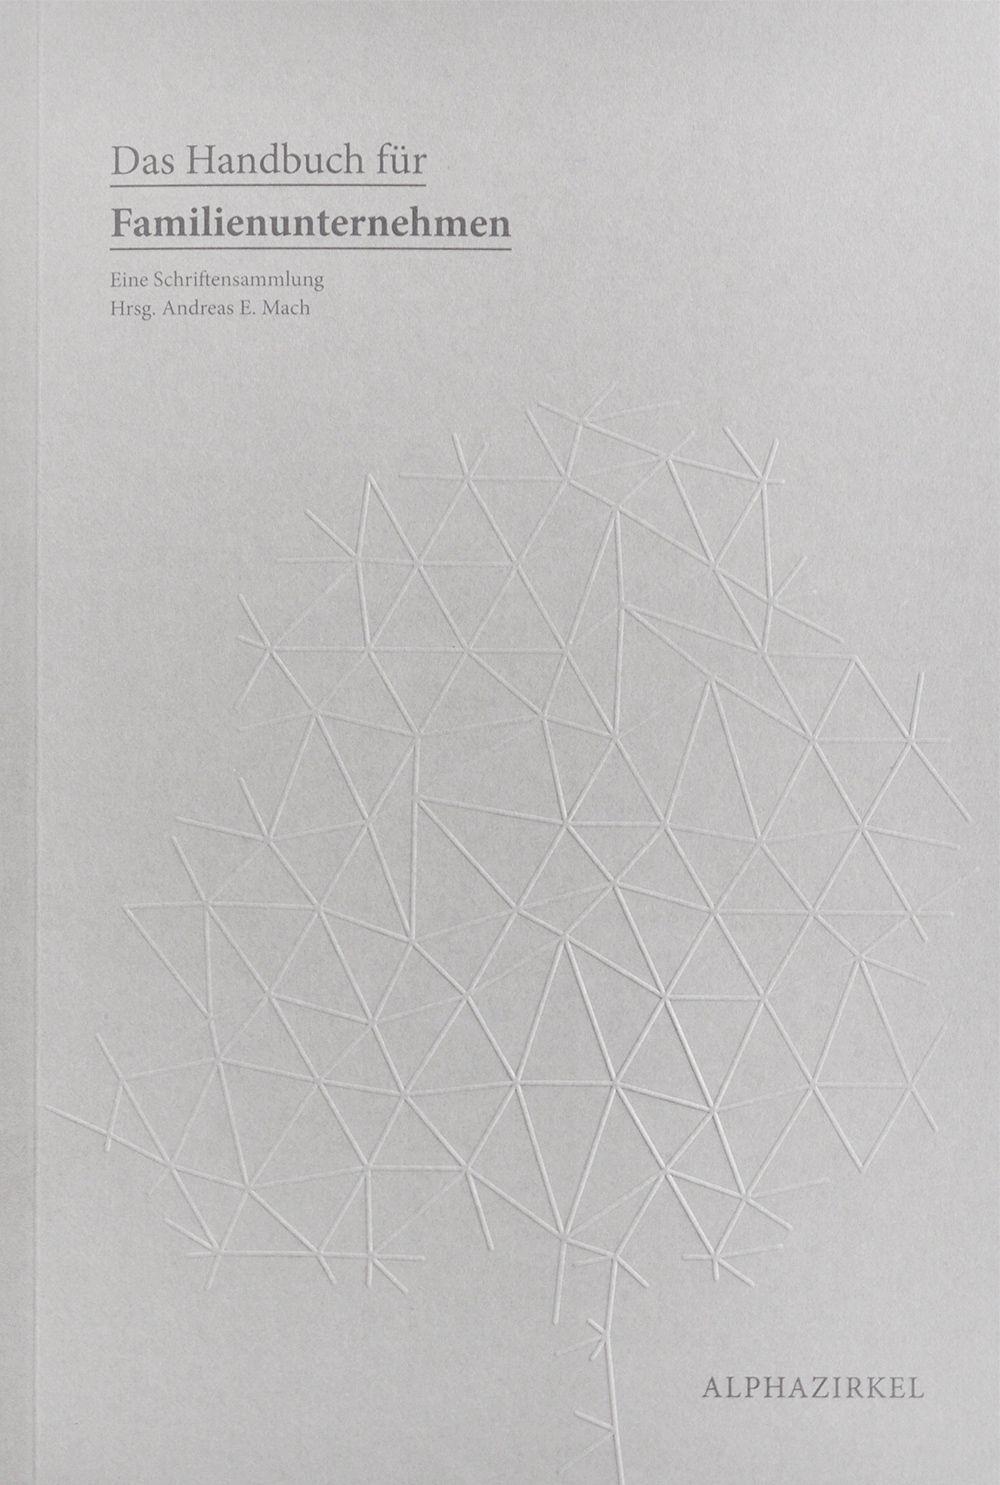 Az Handbuch Cover